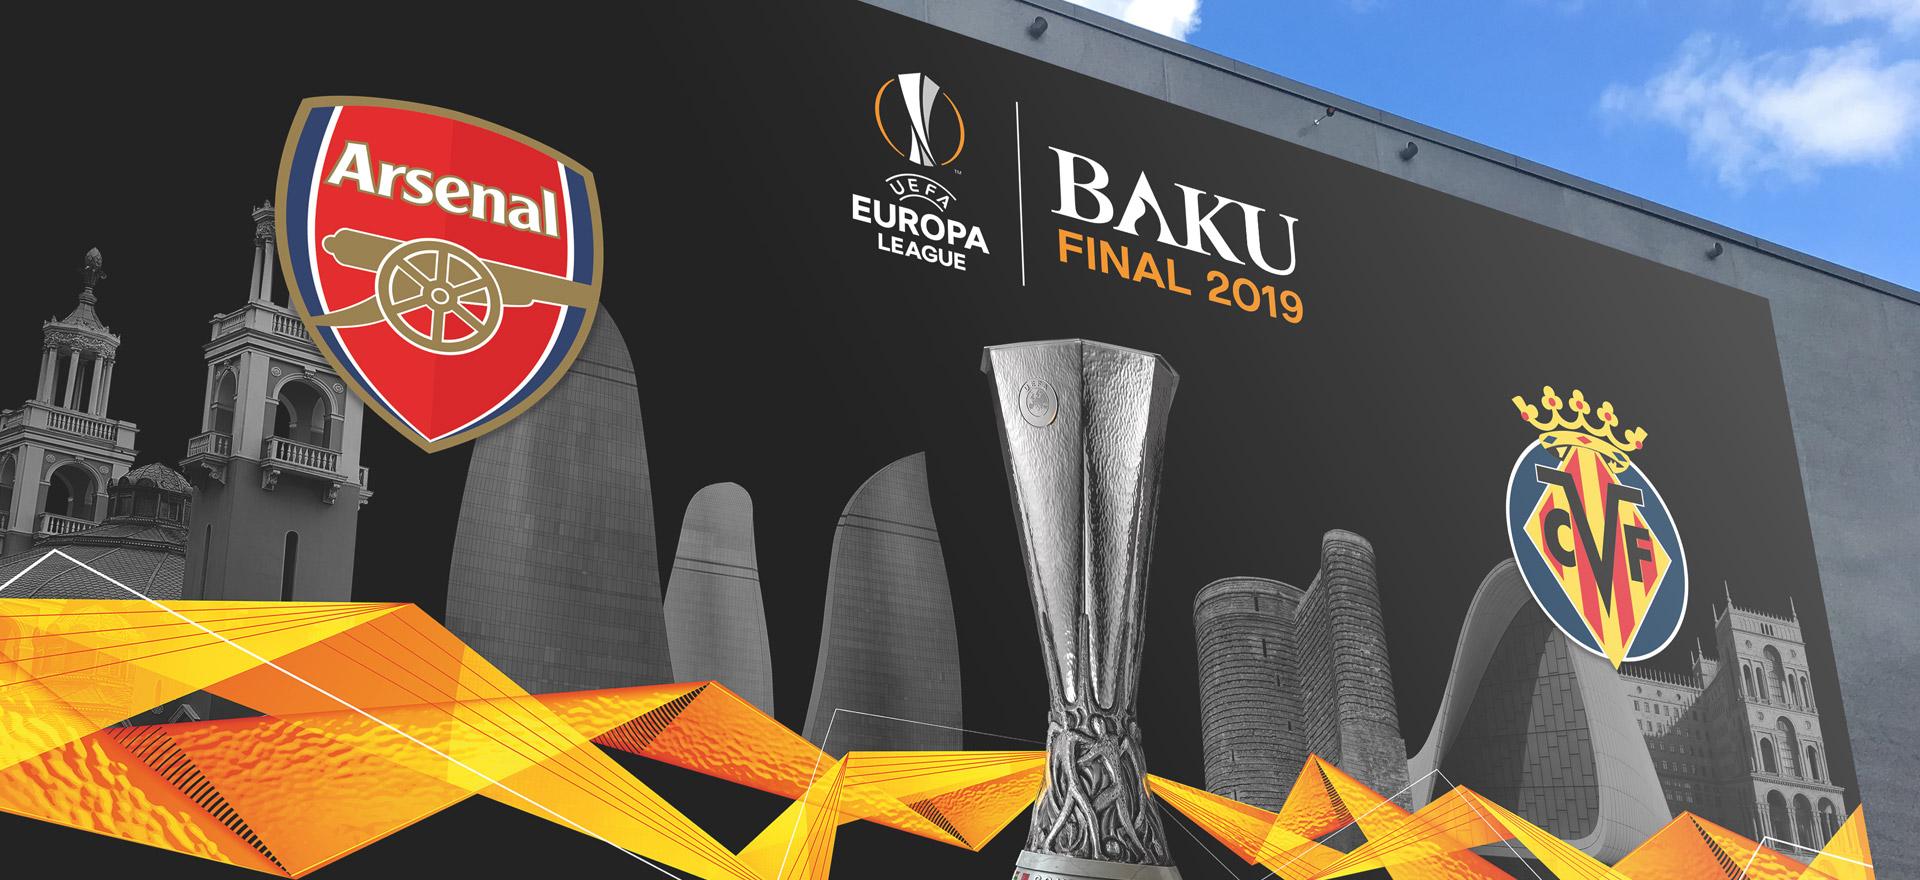 Uefa Europa League Brand Identity Turquoise Branding